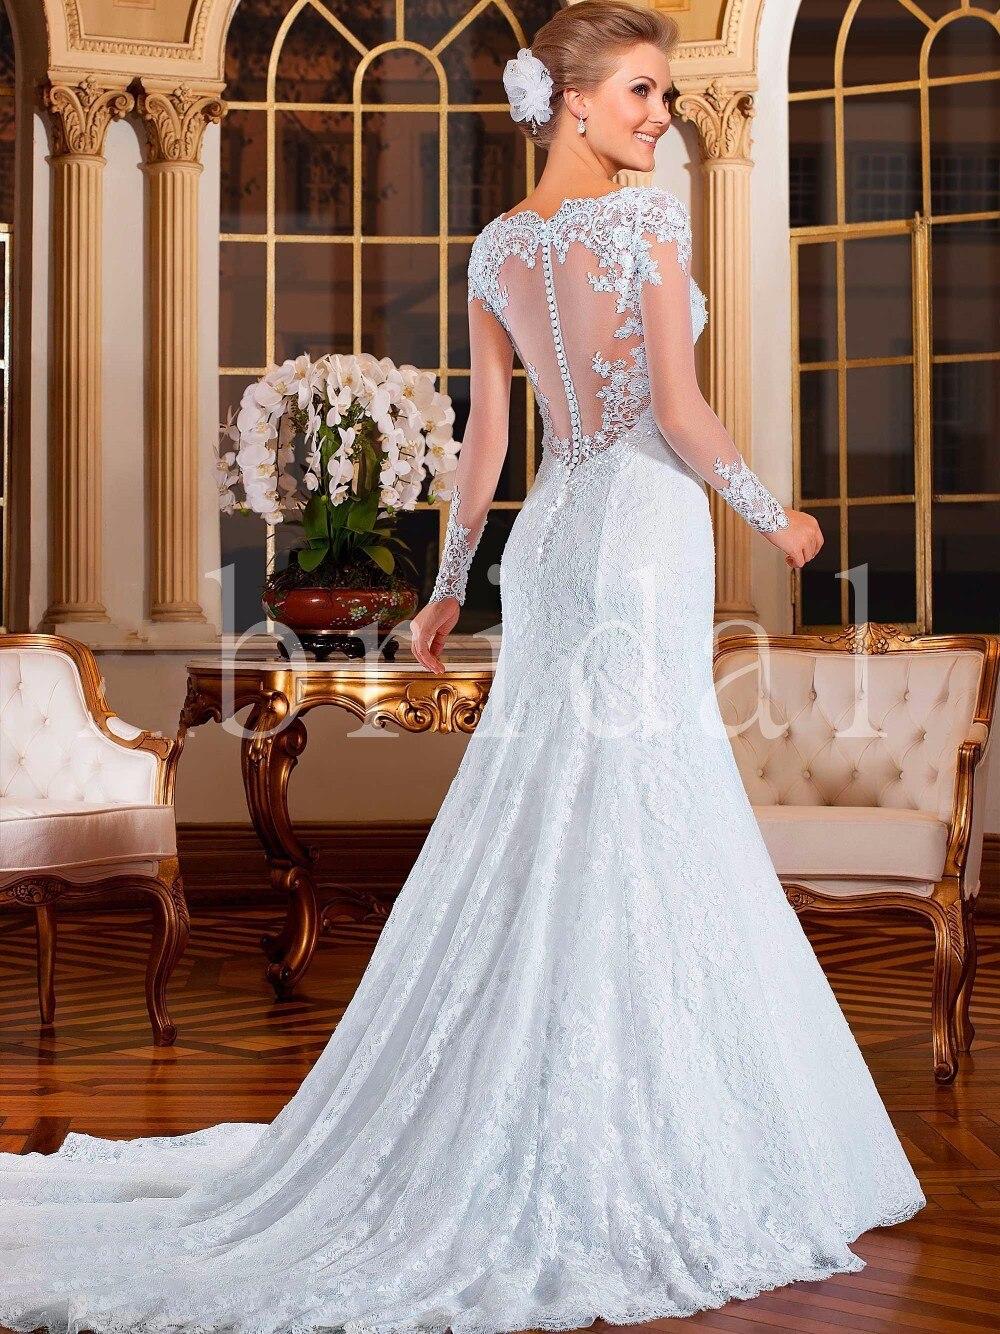 sheer wedding dresses hit runway new york bridal fashion week gallery 1 see through wedding dresses View Gallery Next BRIDES16F 9 WEB gthmb